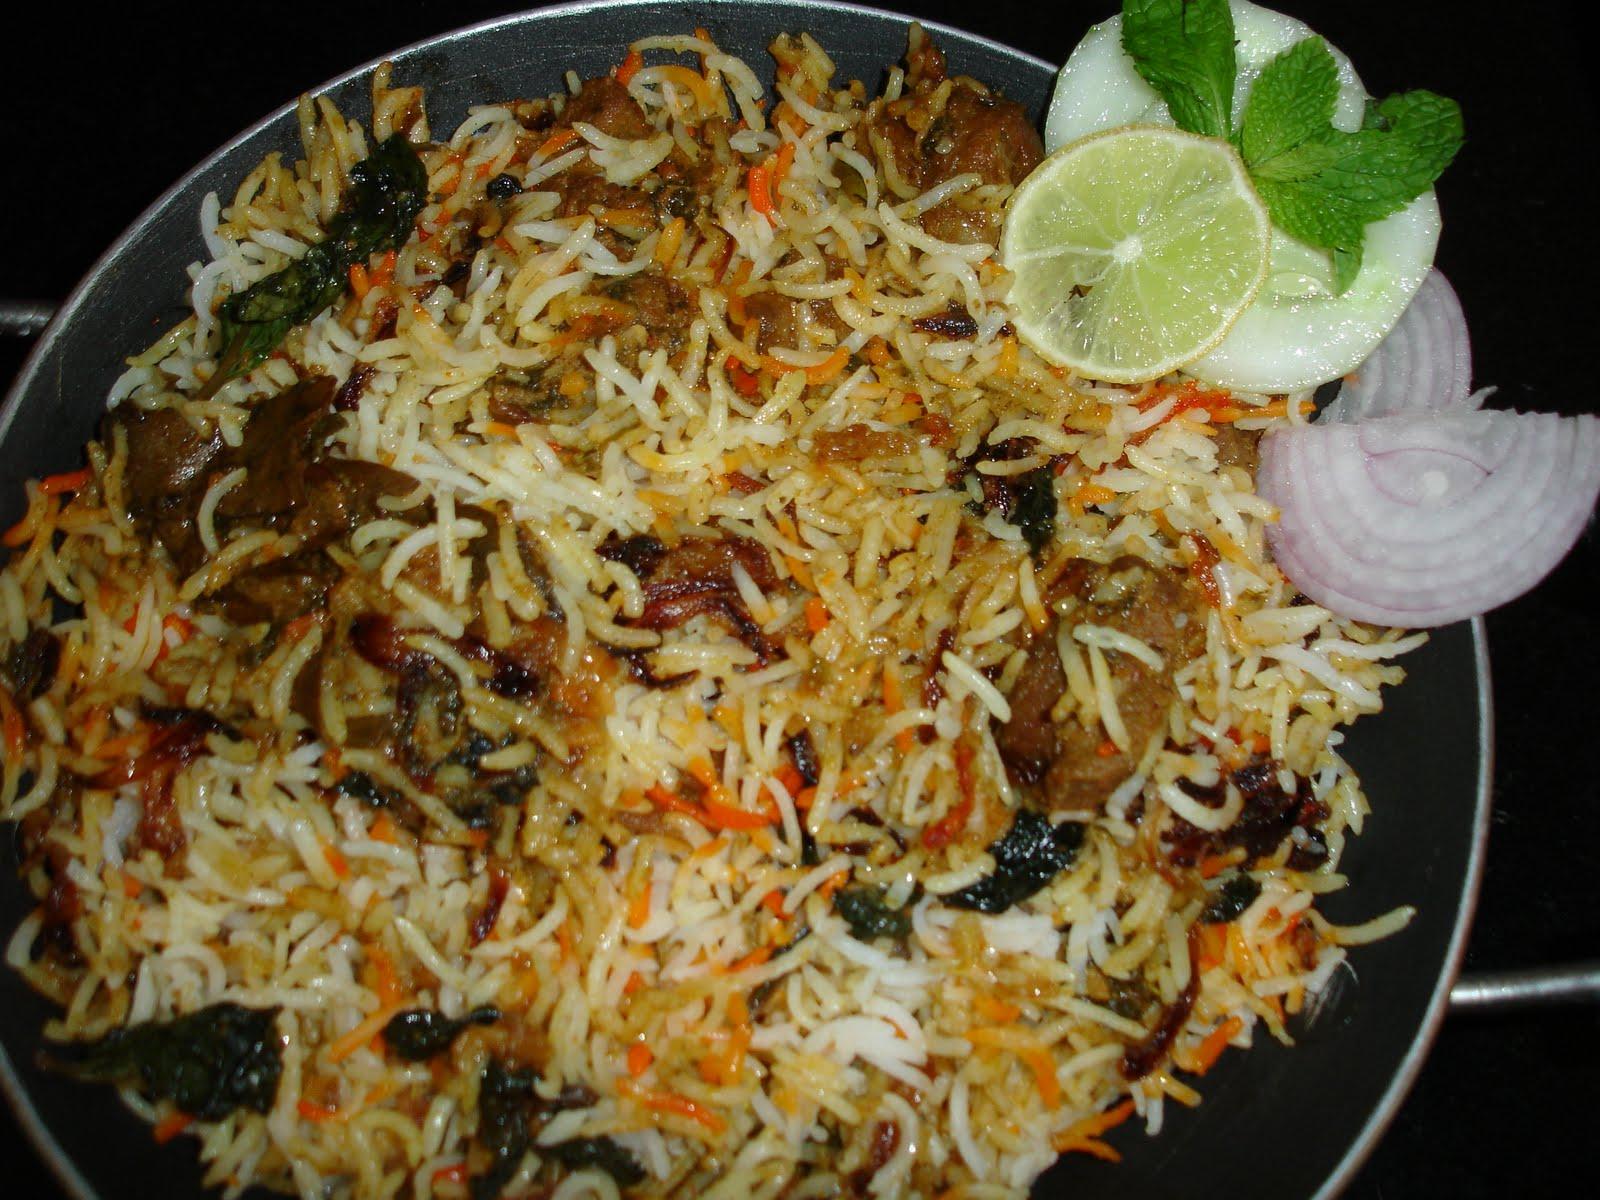 Seetha's Kit... Hyderabadi Chicken Biryani